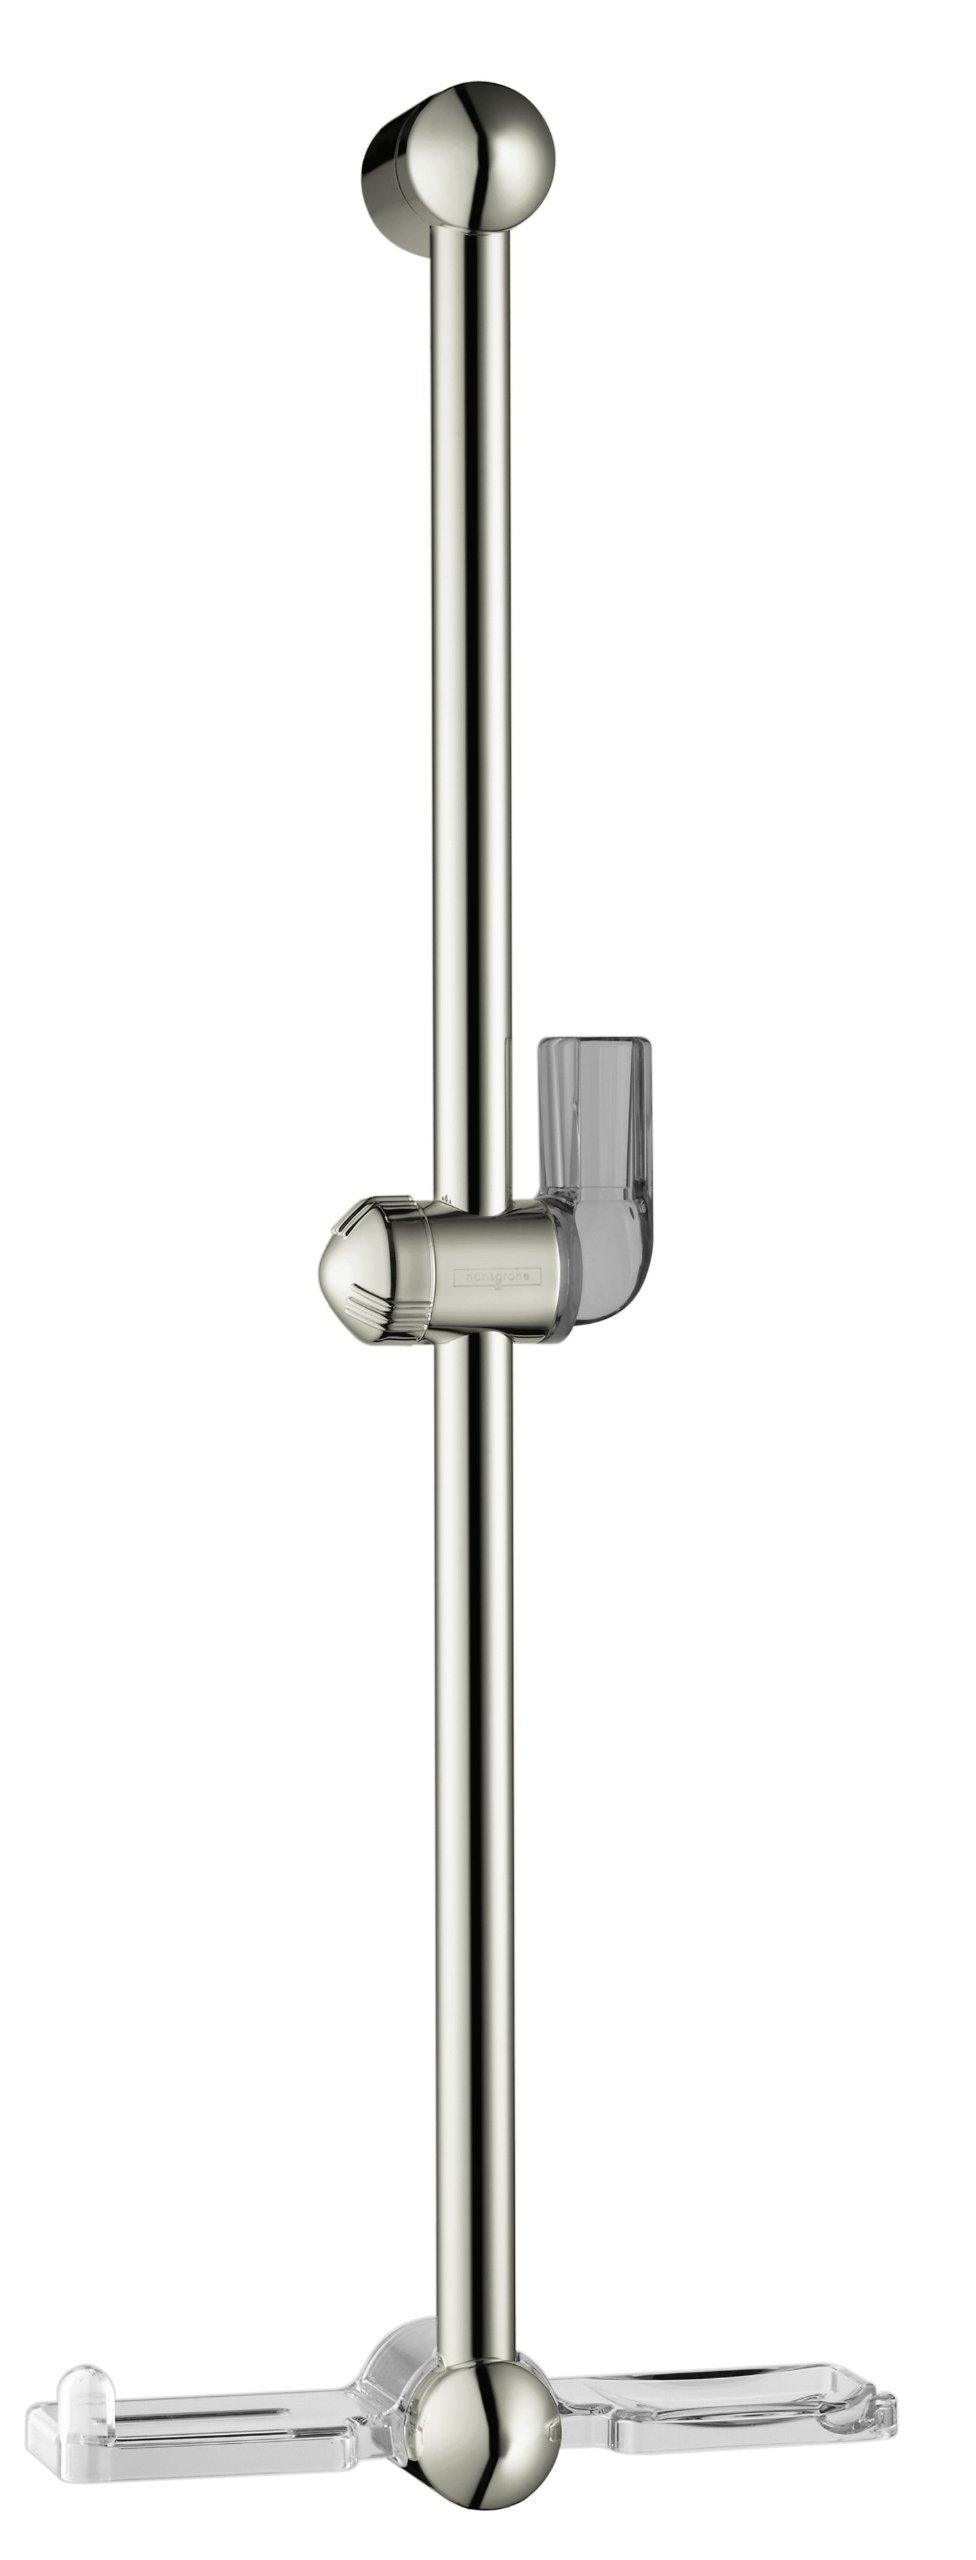 Hansgrohe 06890830 Unica E Wall Bar, 26-Inch, Polished Nickel